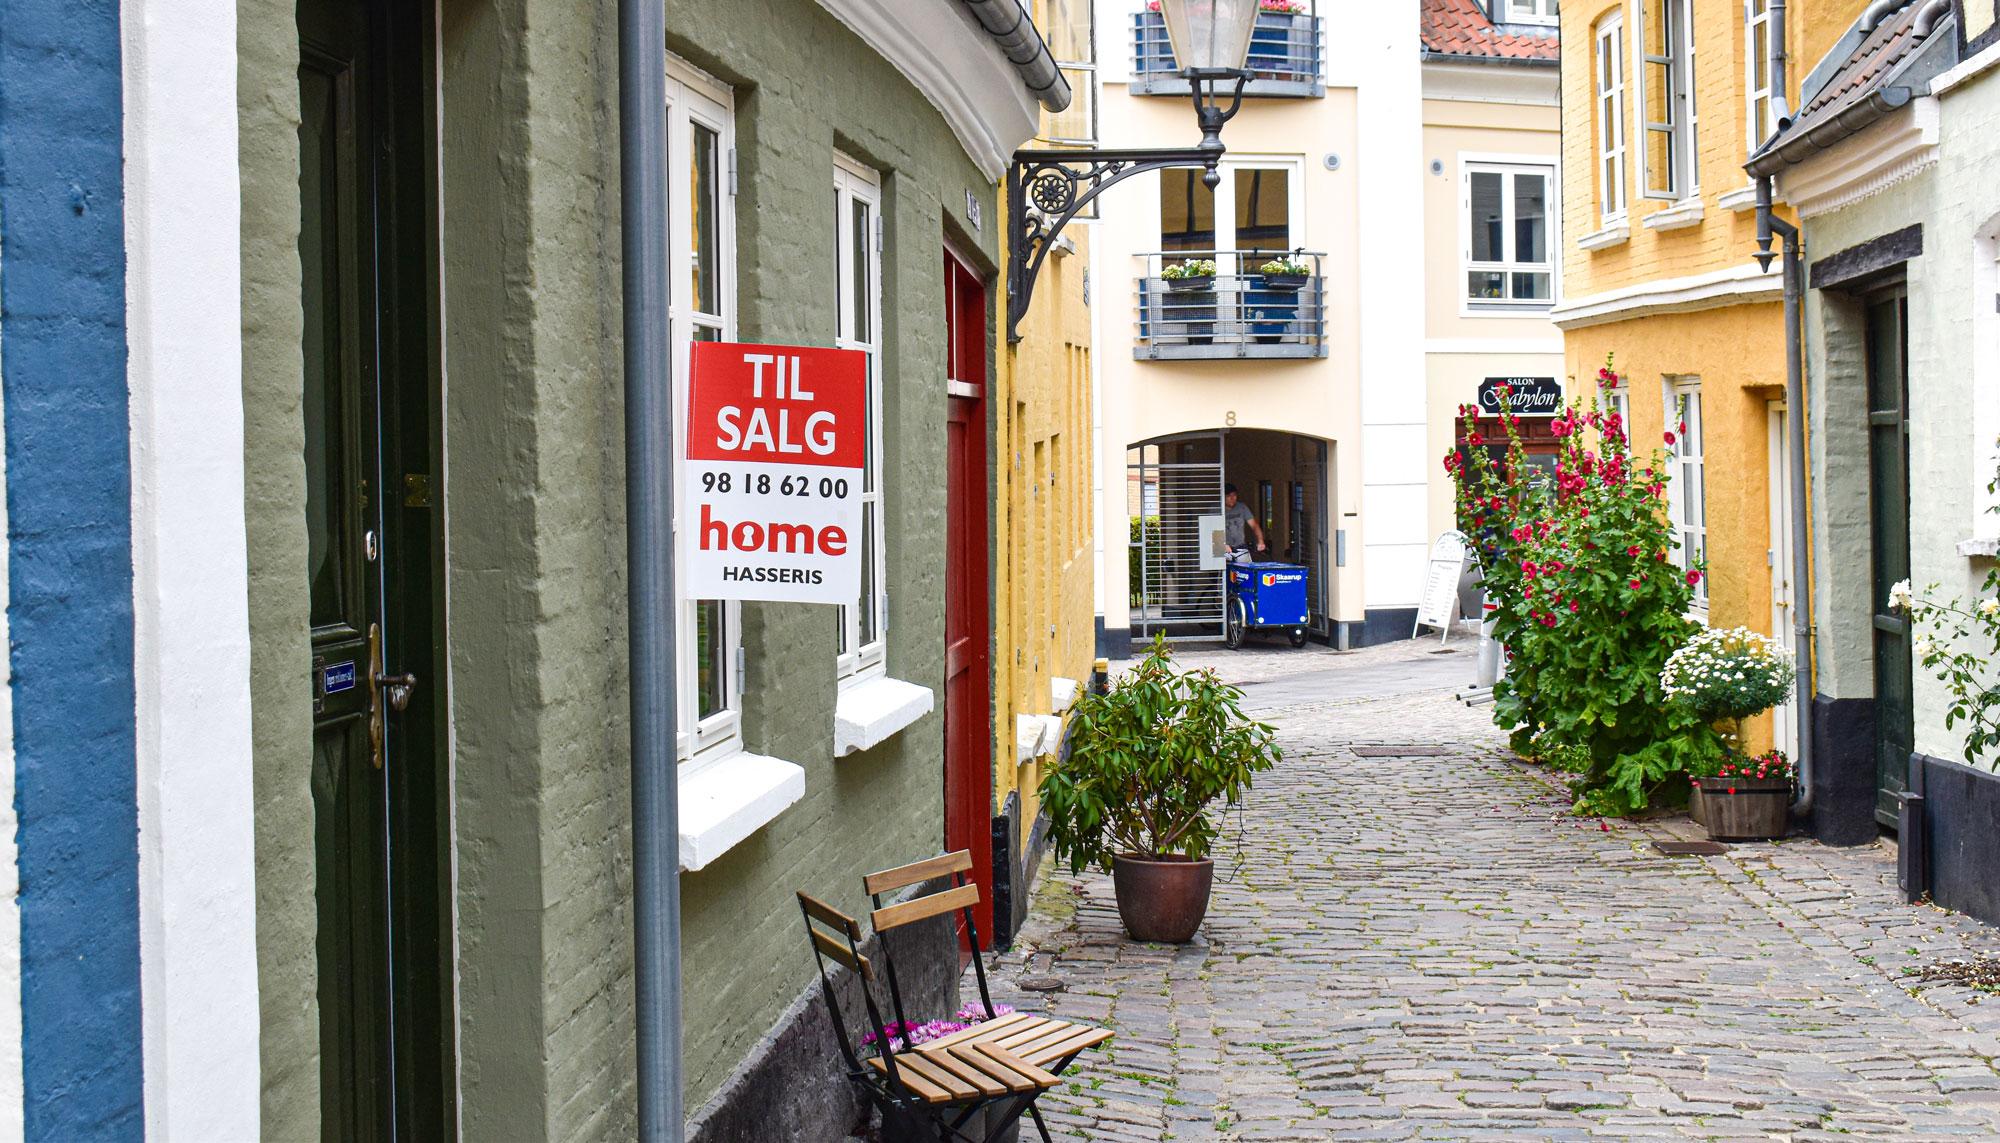 Helt unikt: Tre byhuse er til salg i Hjelmerstald